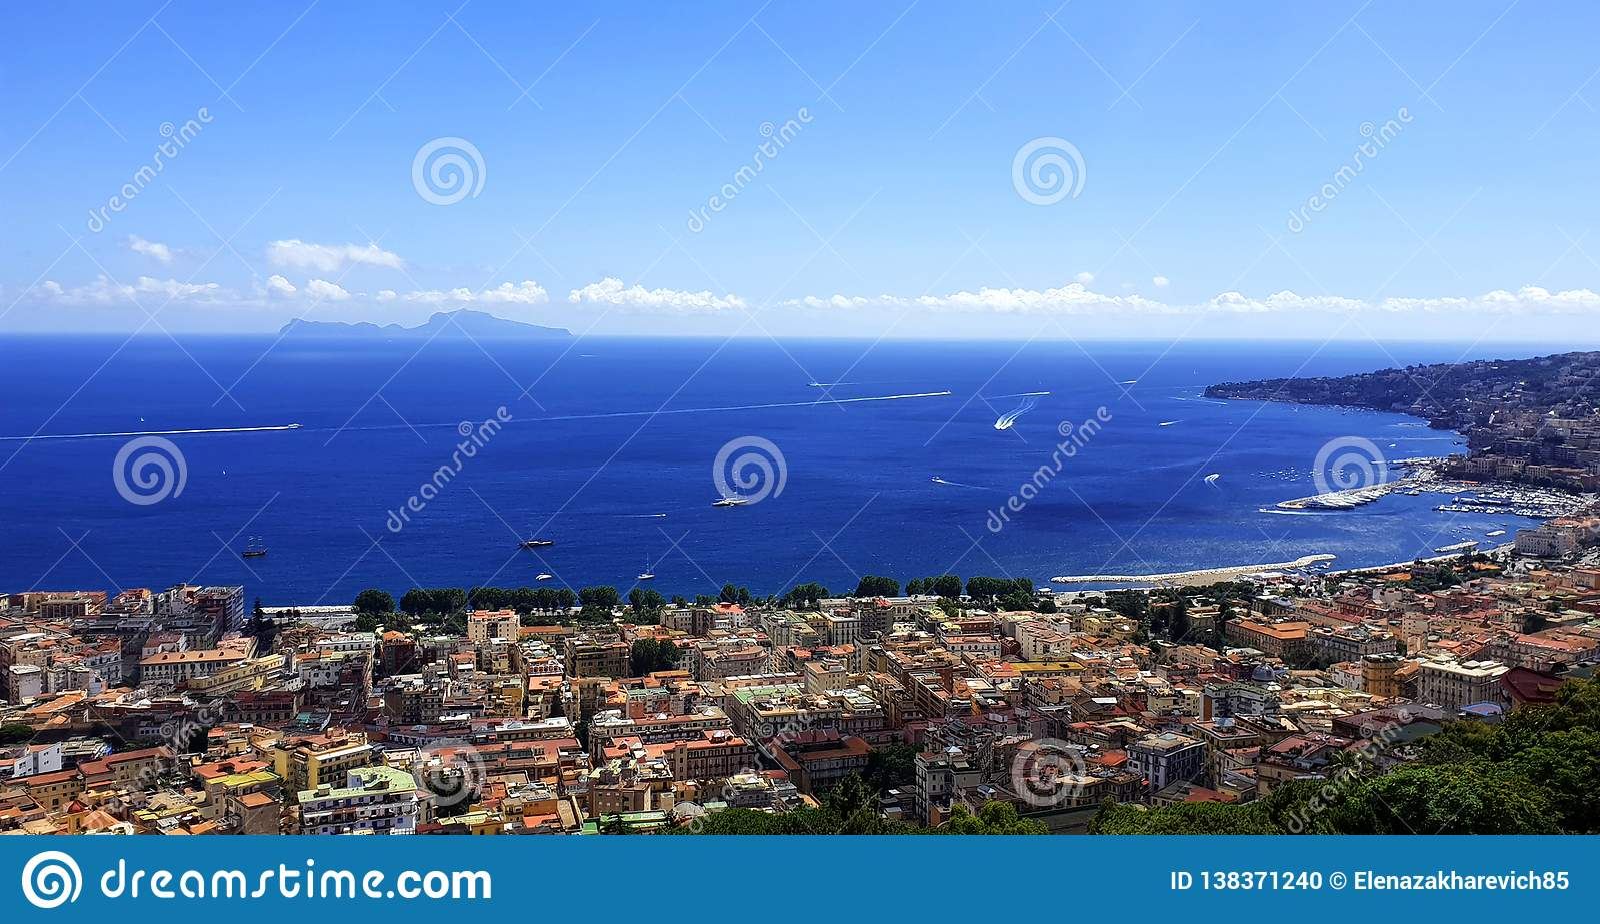 Naples. View of the Mediterranean Sea